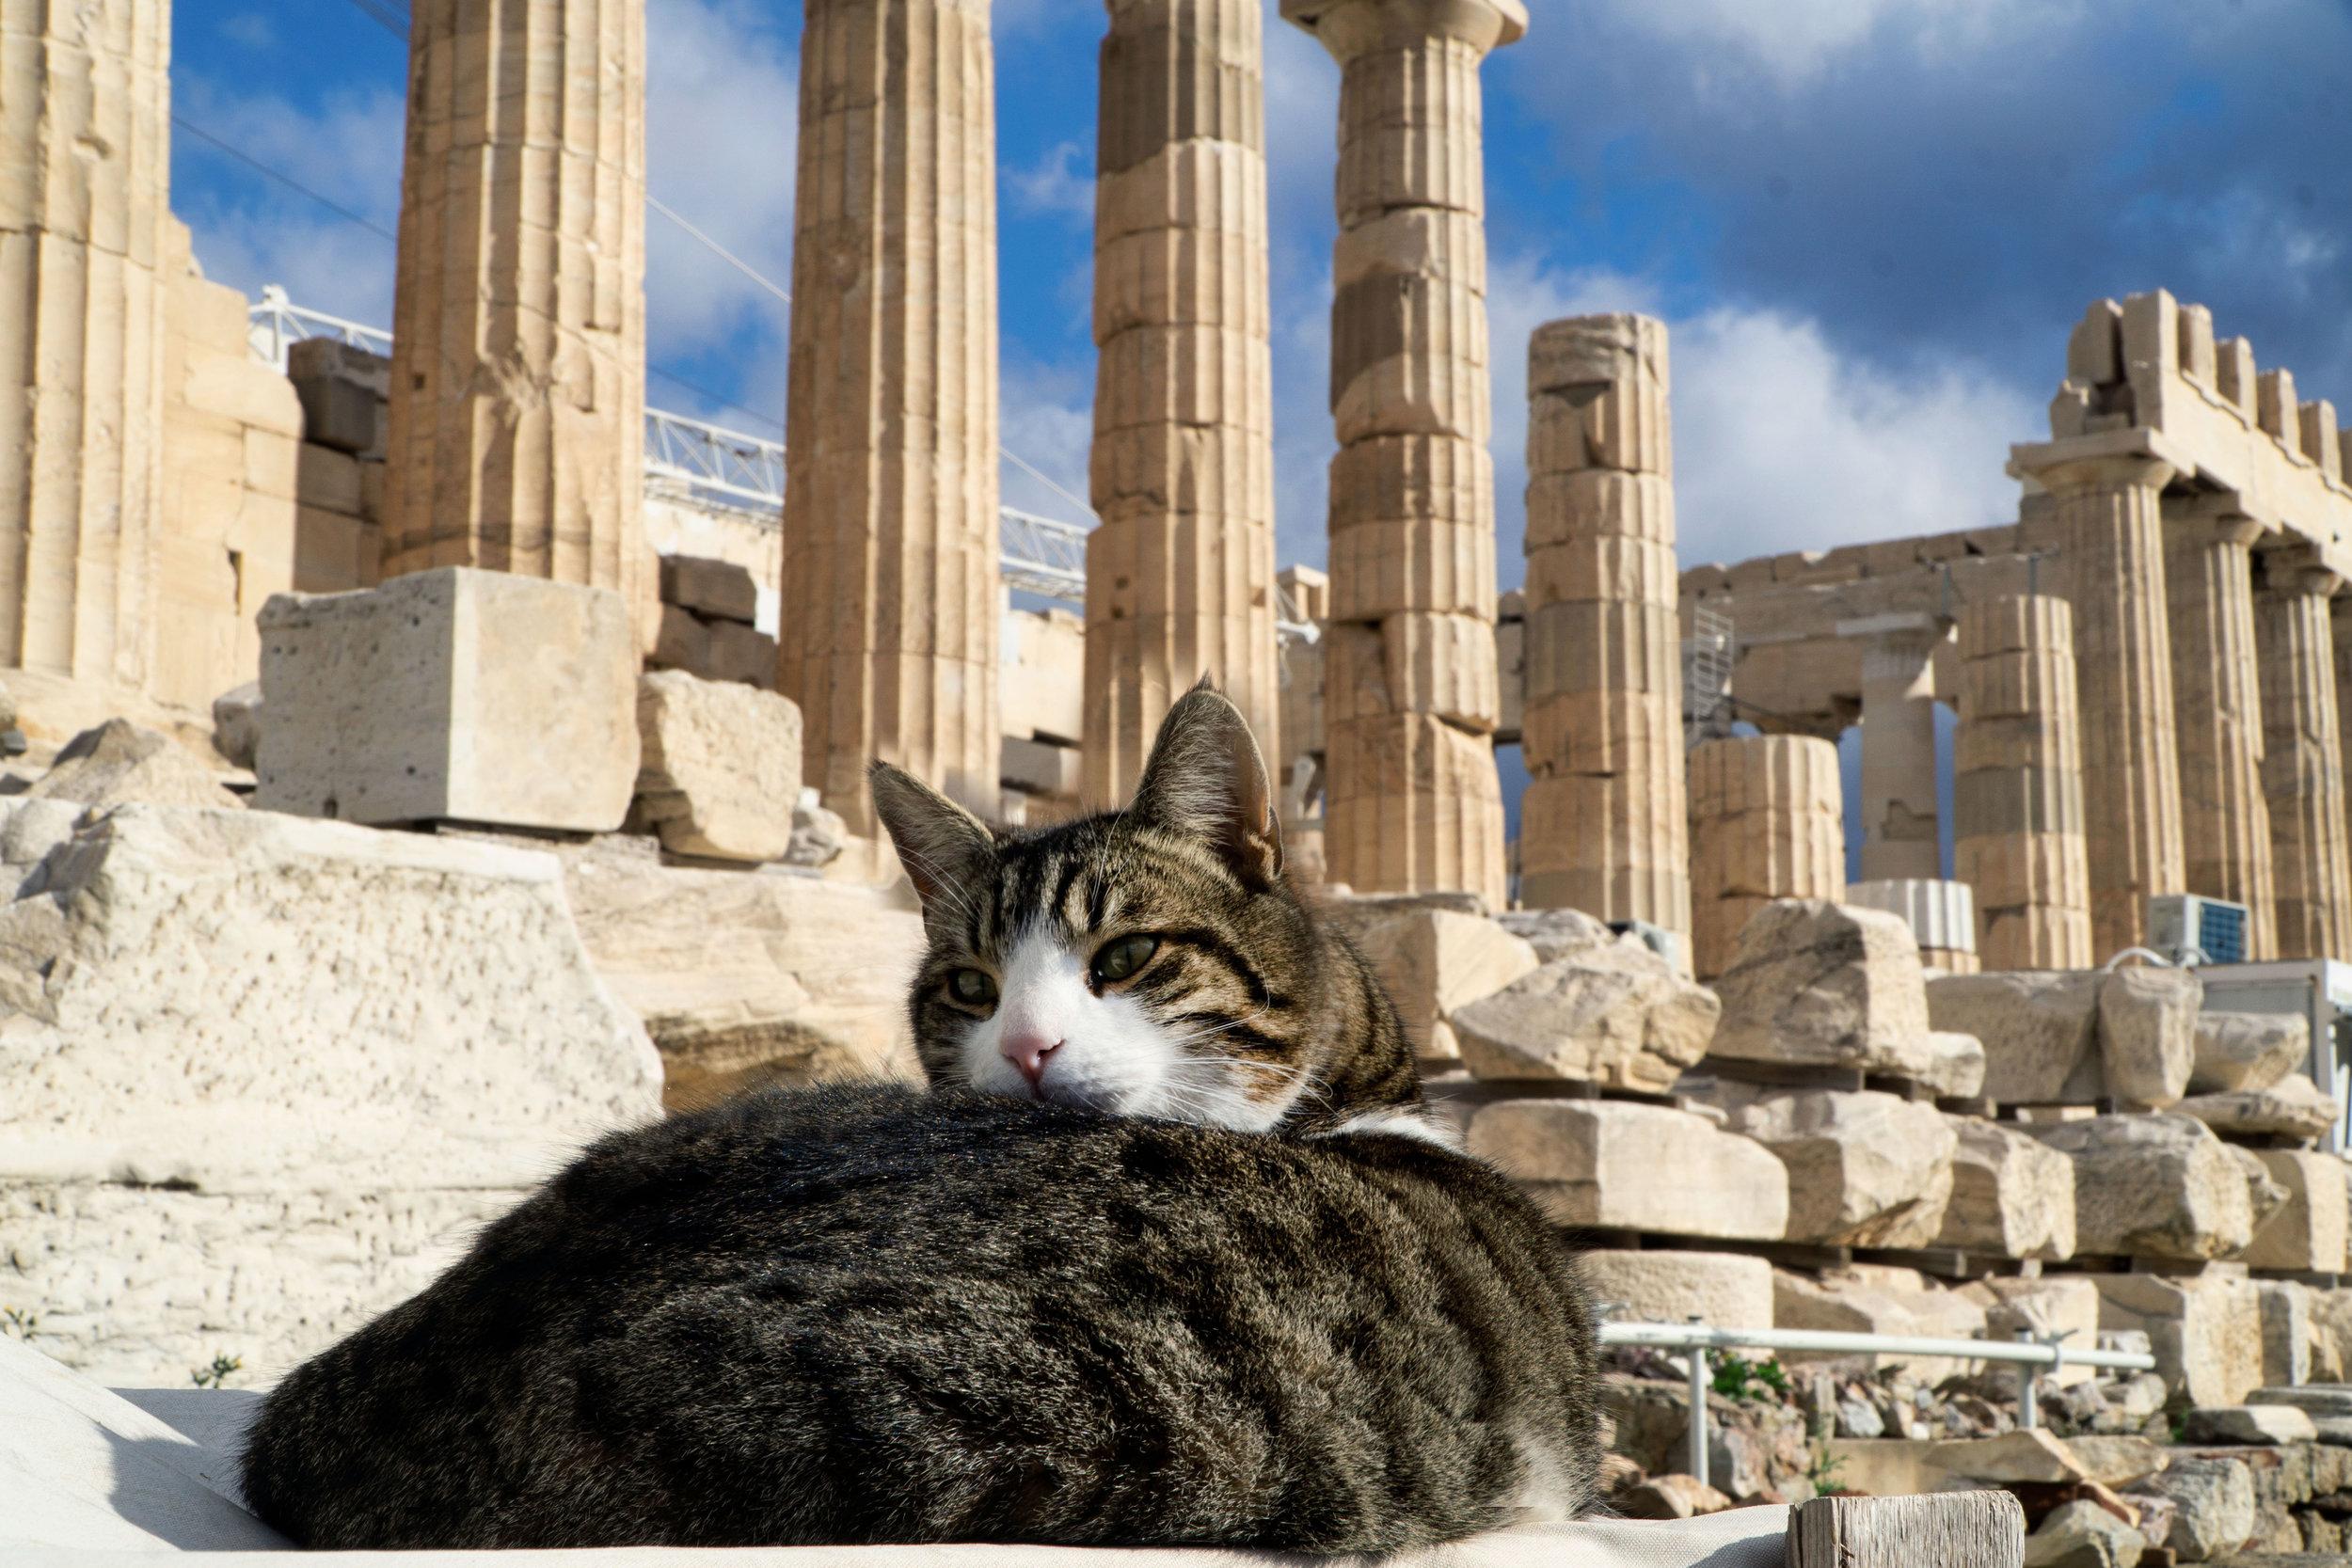 athens_acropolis_vickygood_travel_photographysm.jpg